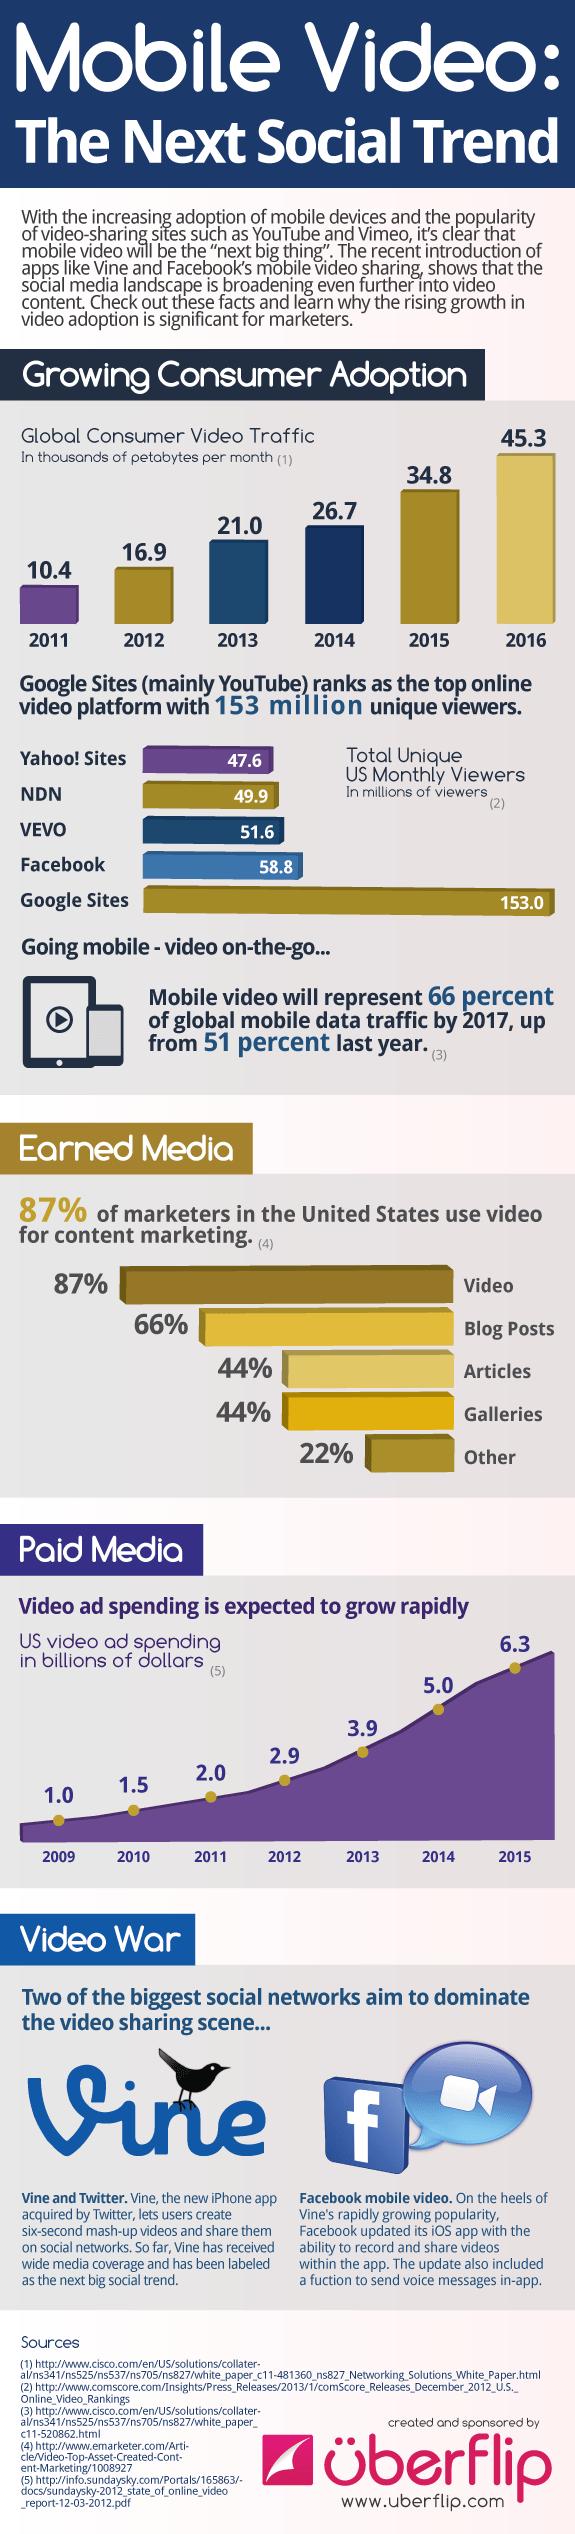 Vídeo móvil: la próxima tendencia social